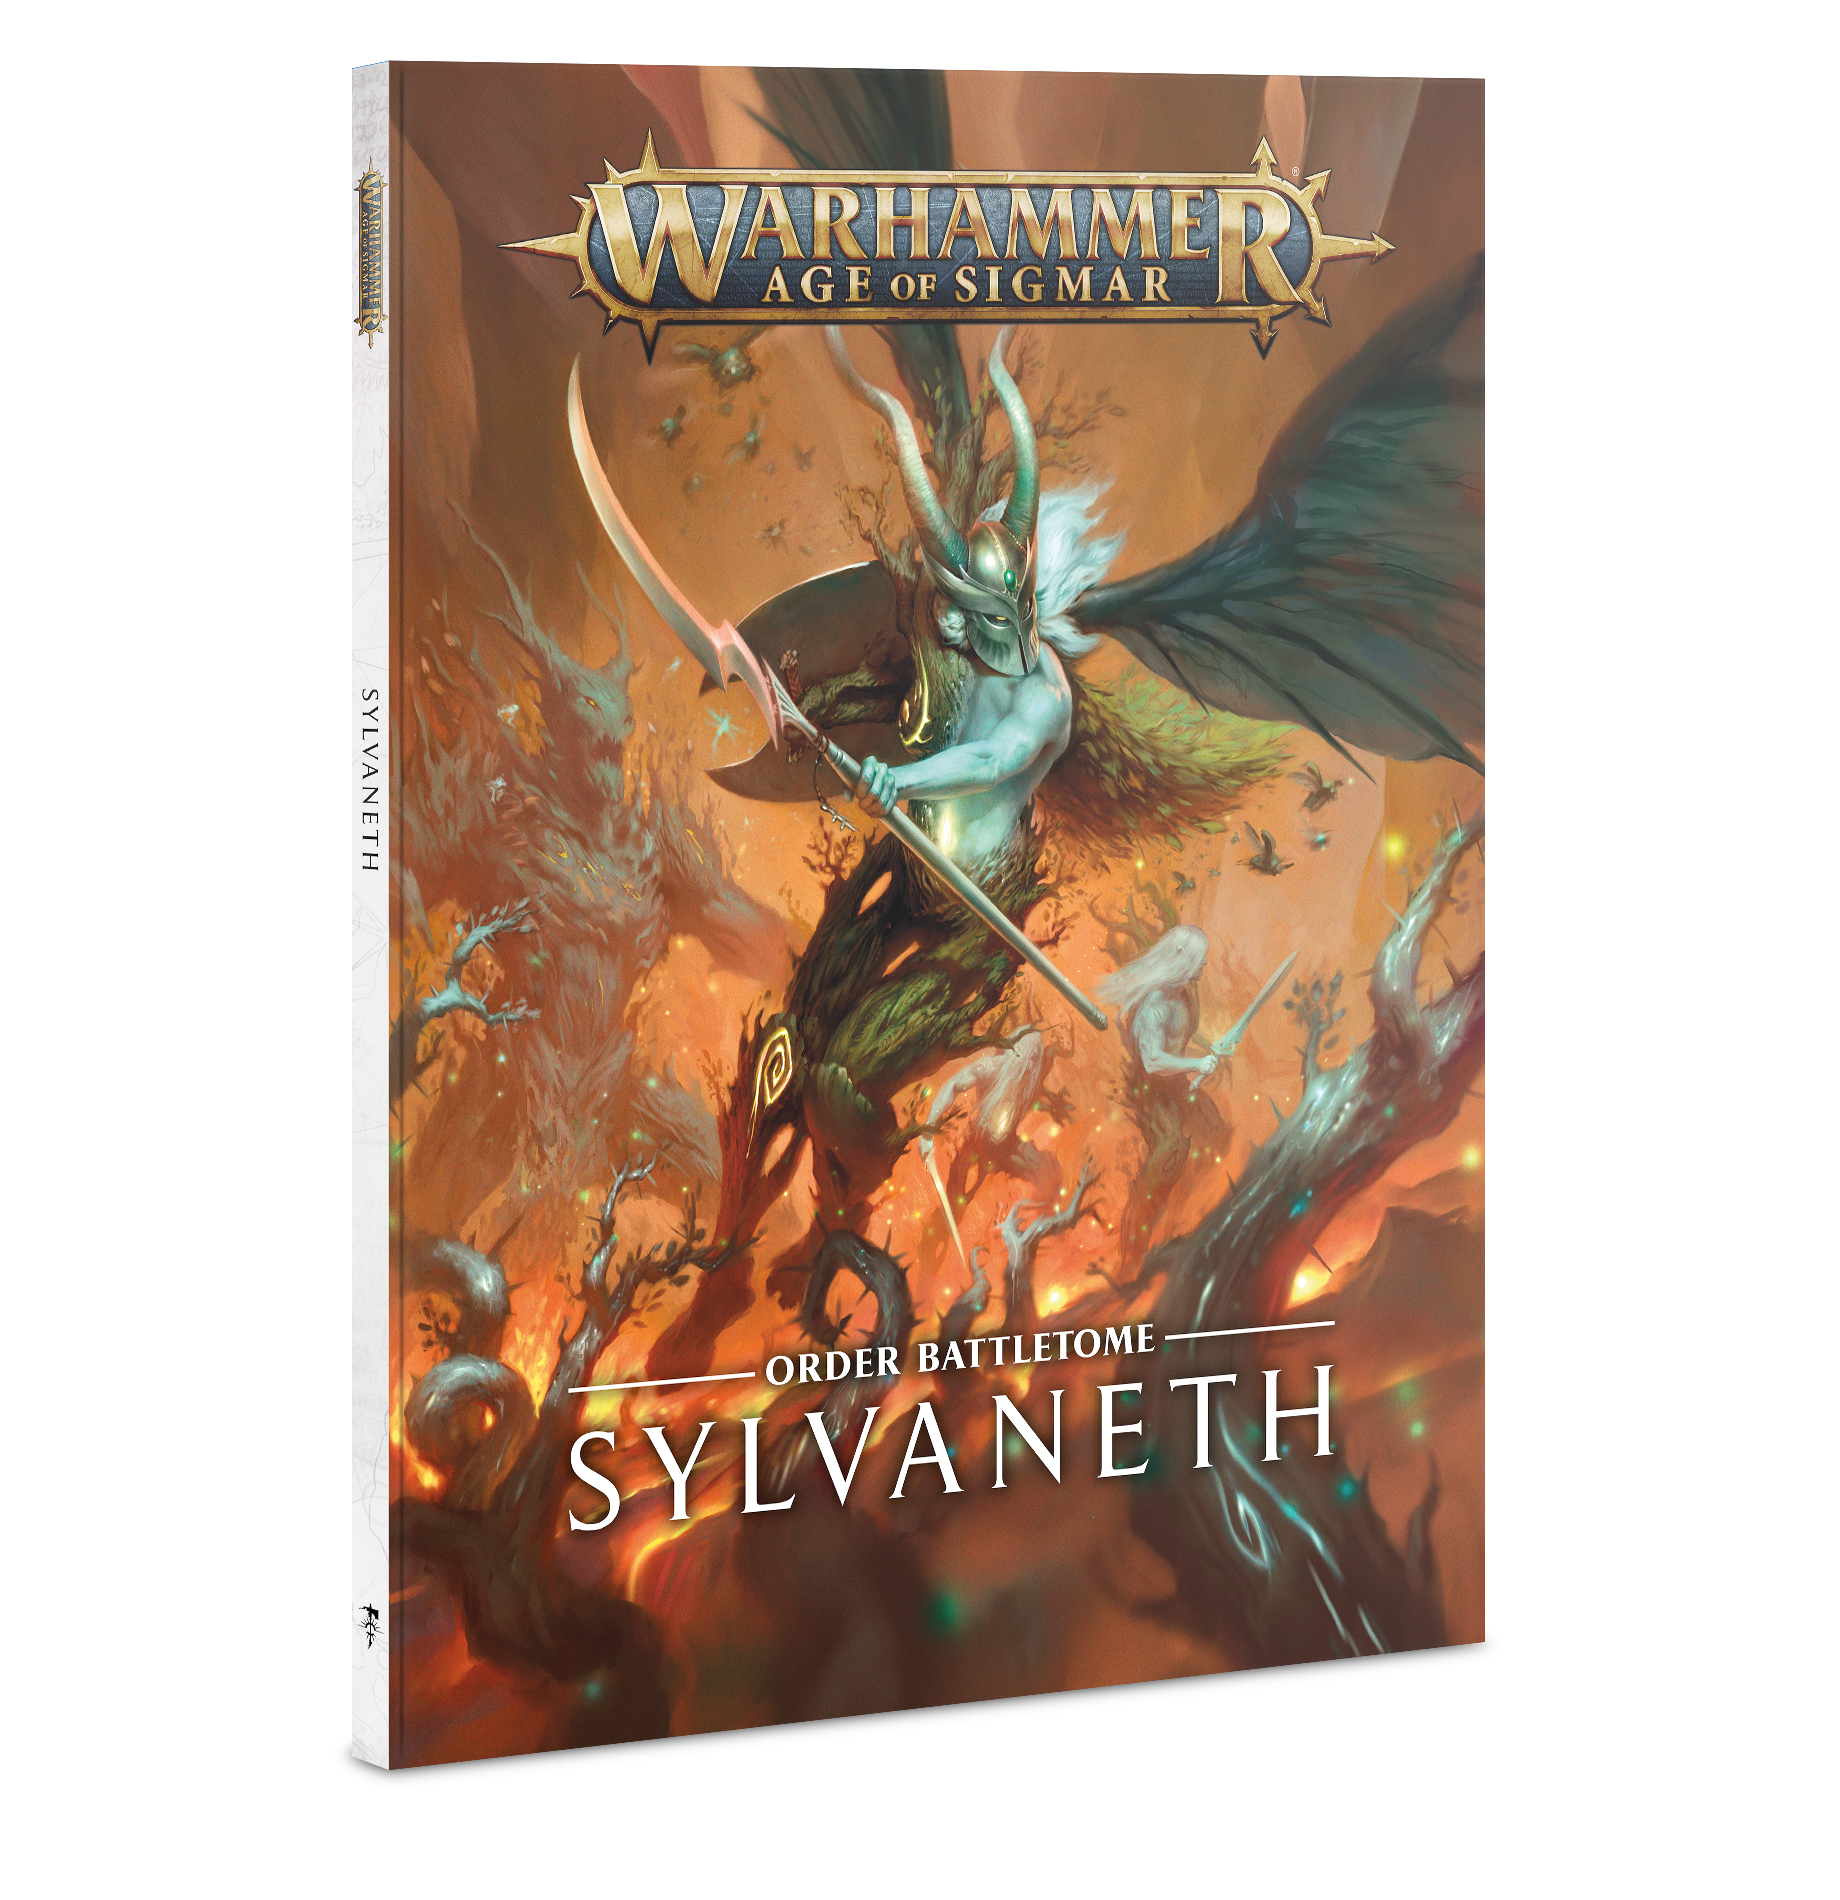 Warhammer Age Of Sigmar: Sylvaneth Battletome Game Box